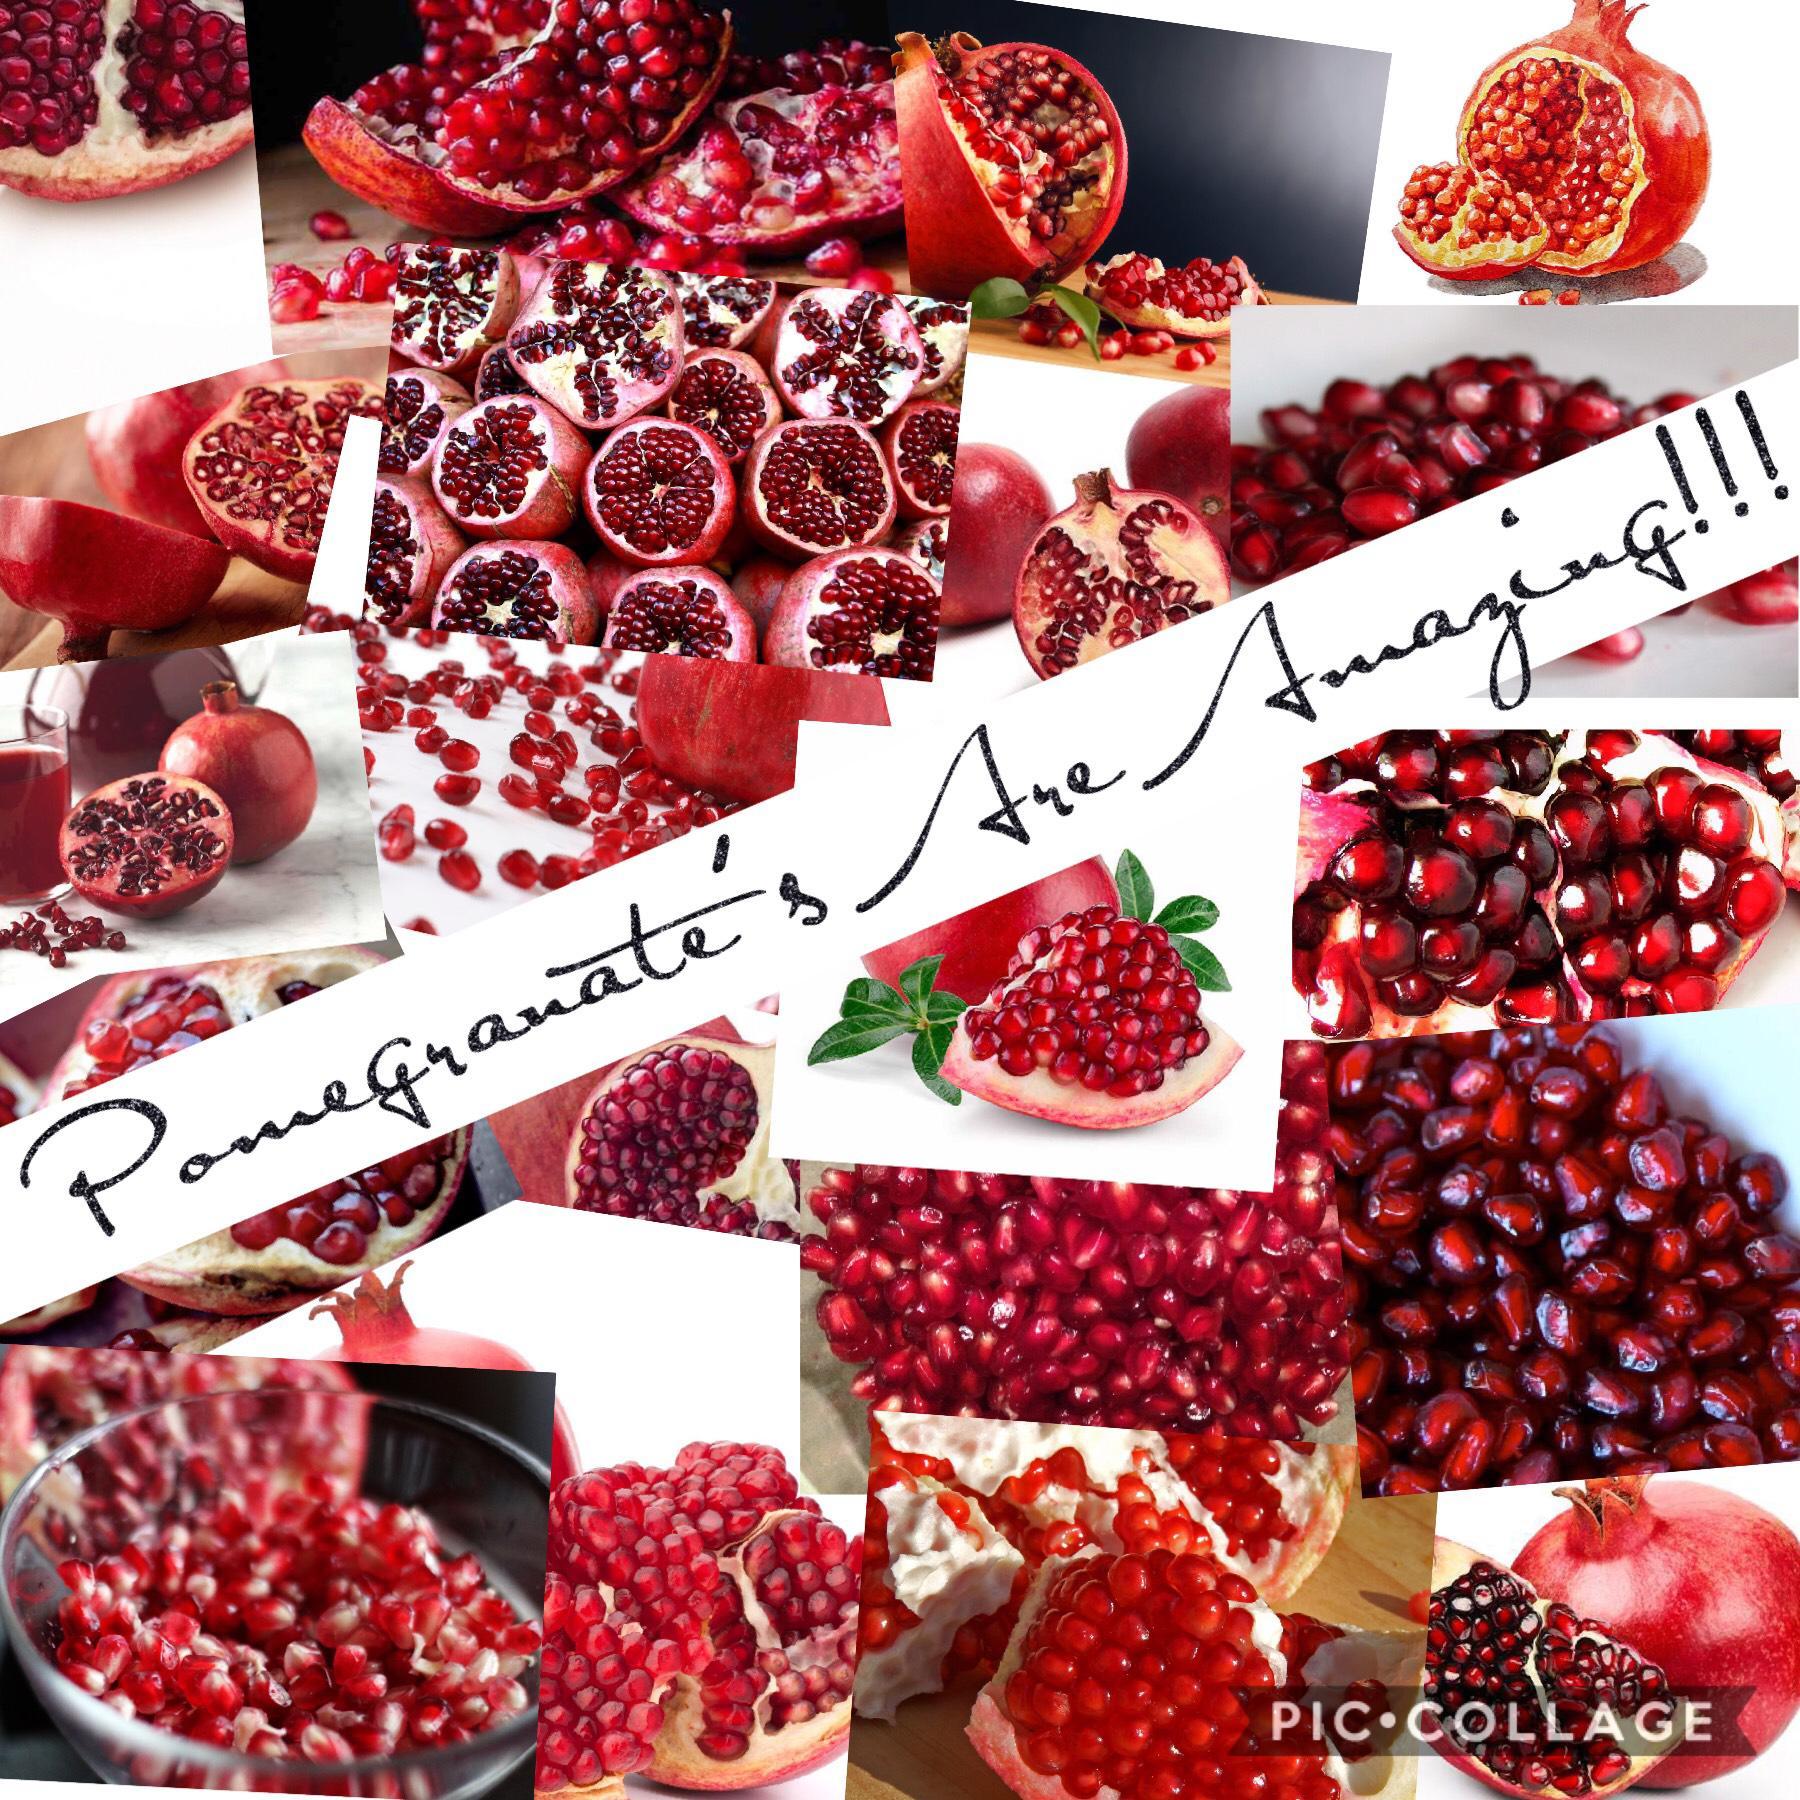 Pomegranate's?!